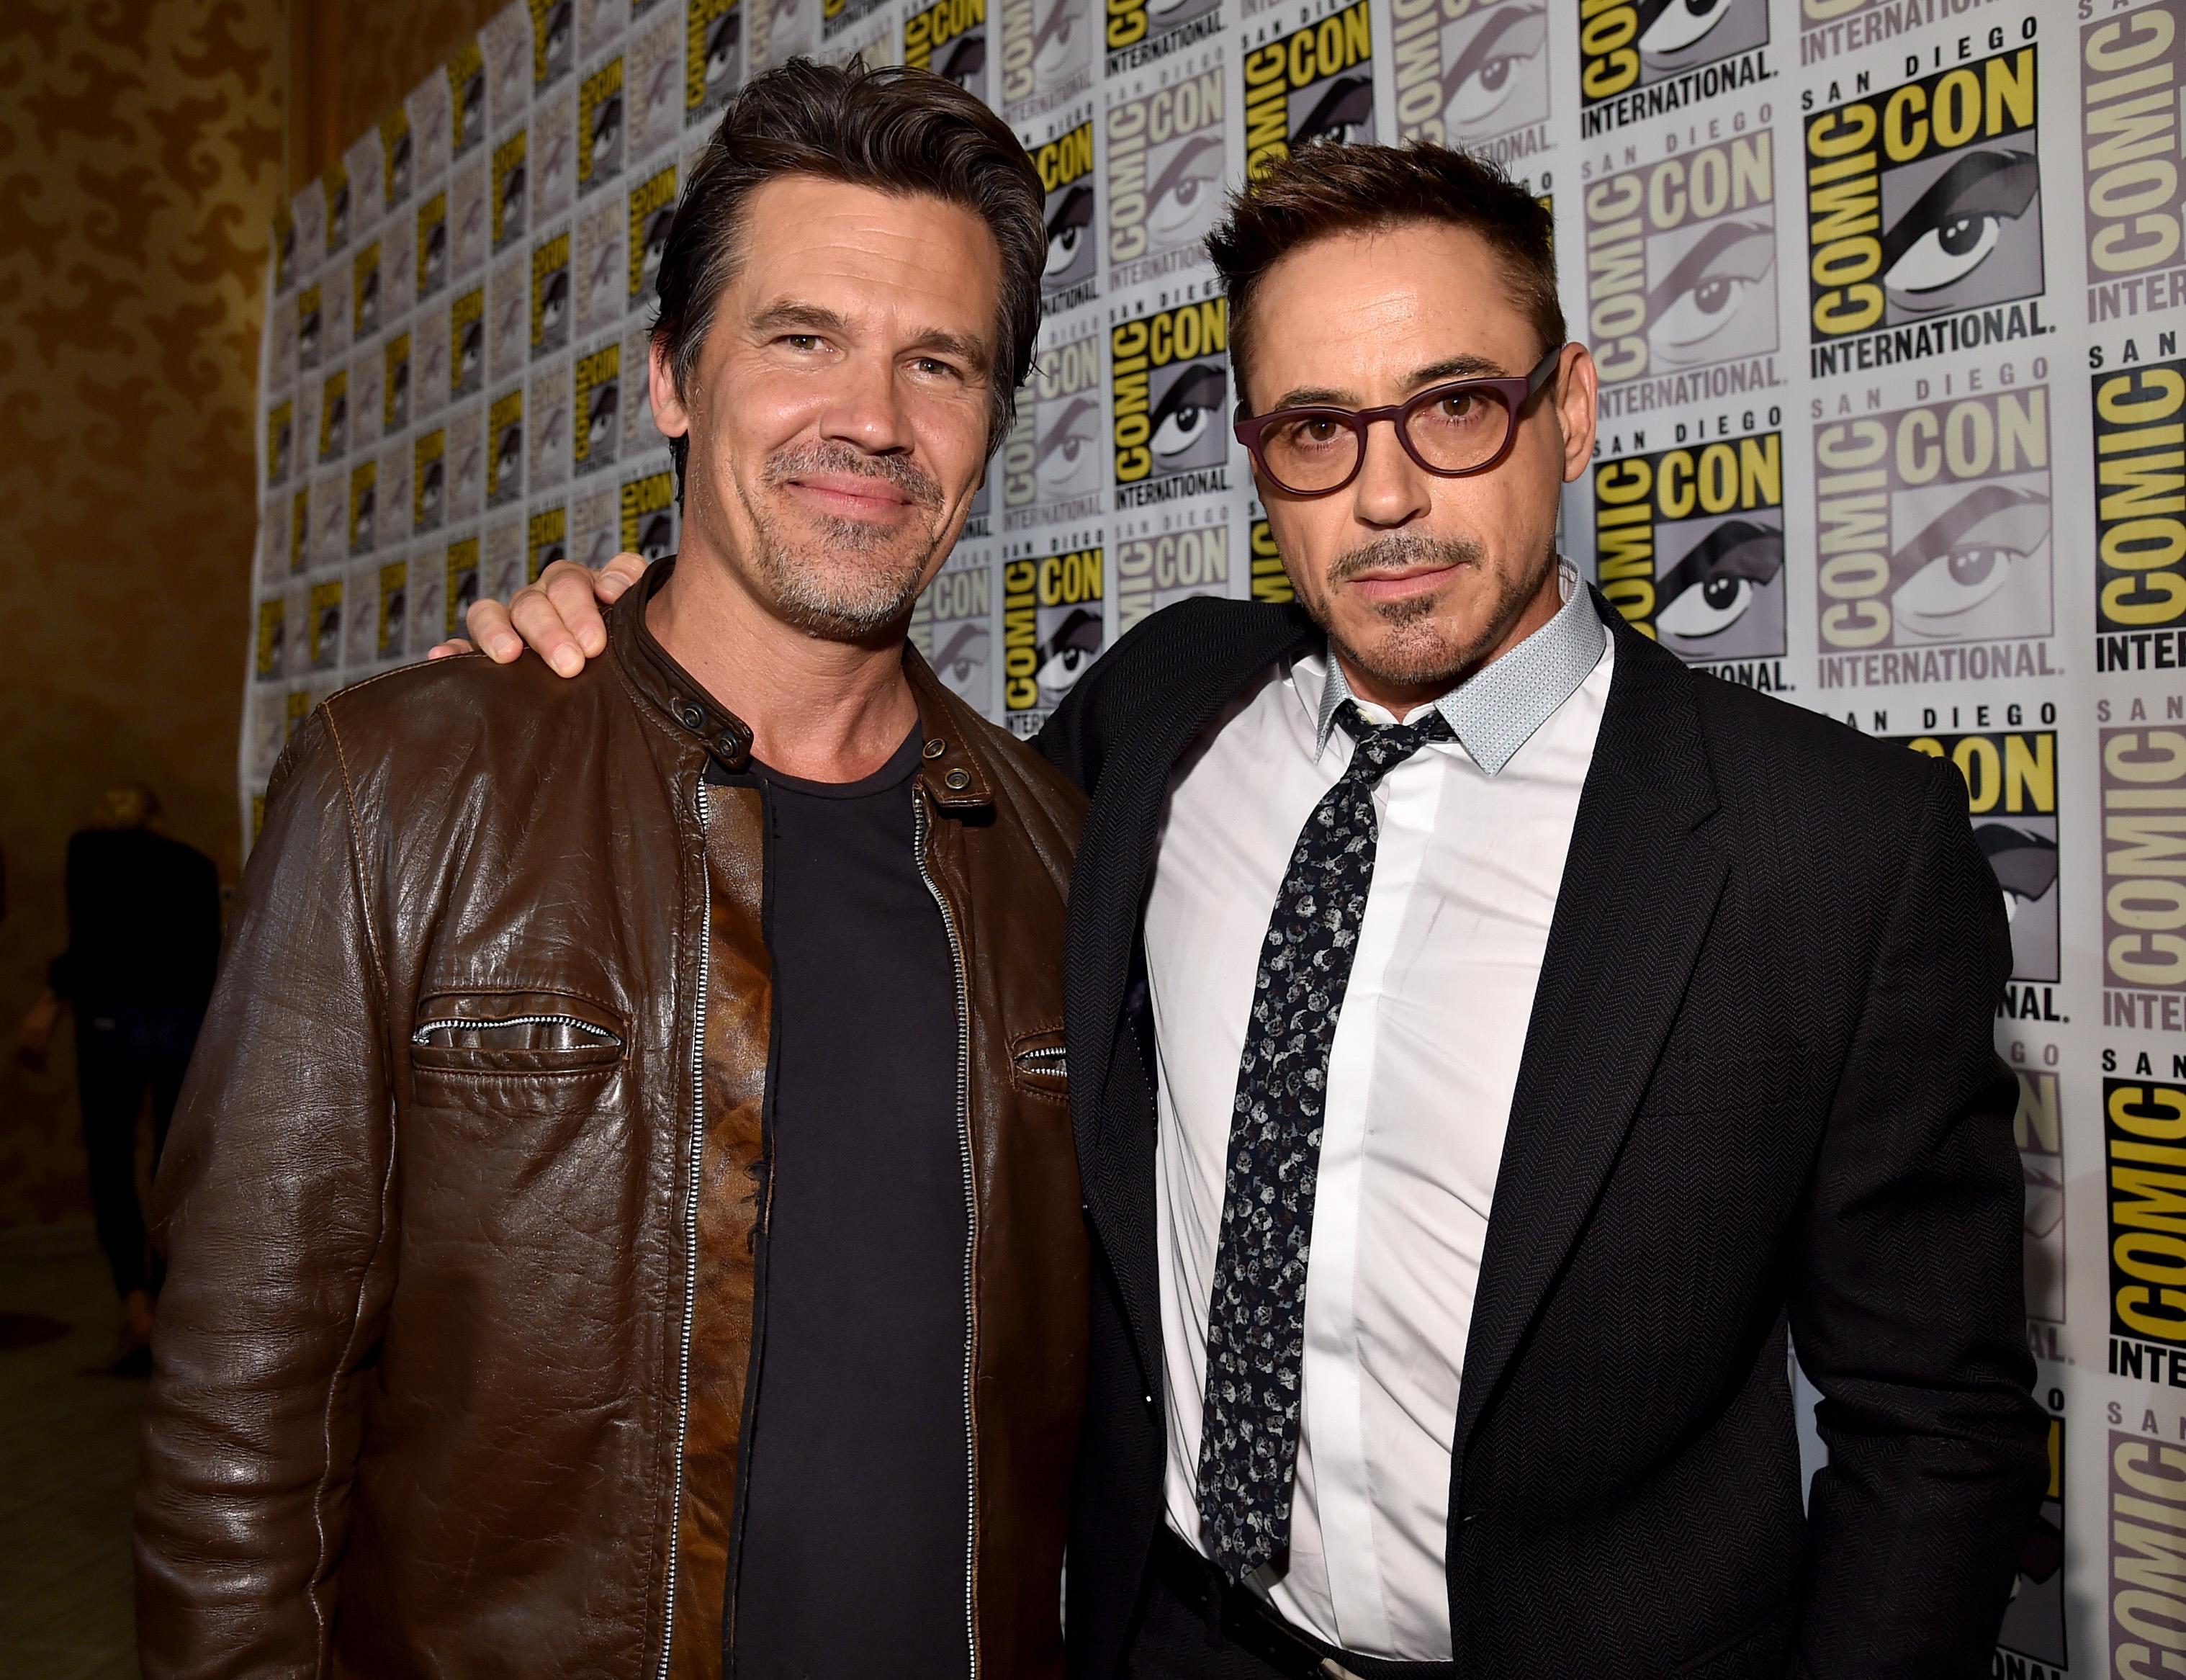 Robert Downey Jr Son Name Josh Brolin And Robert Downey Jr